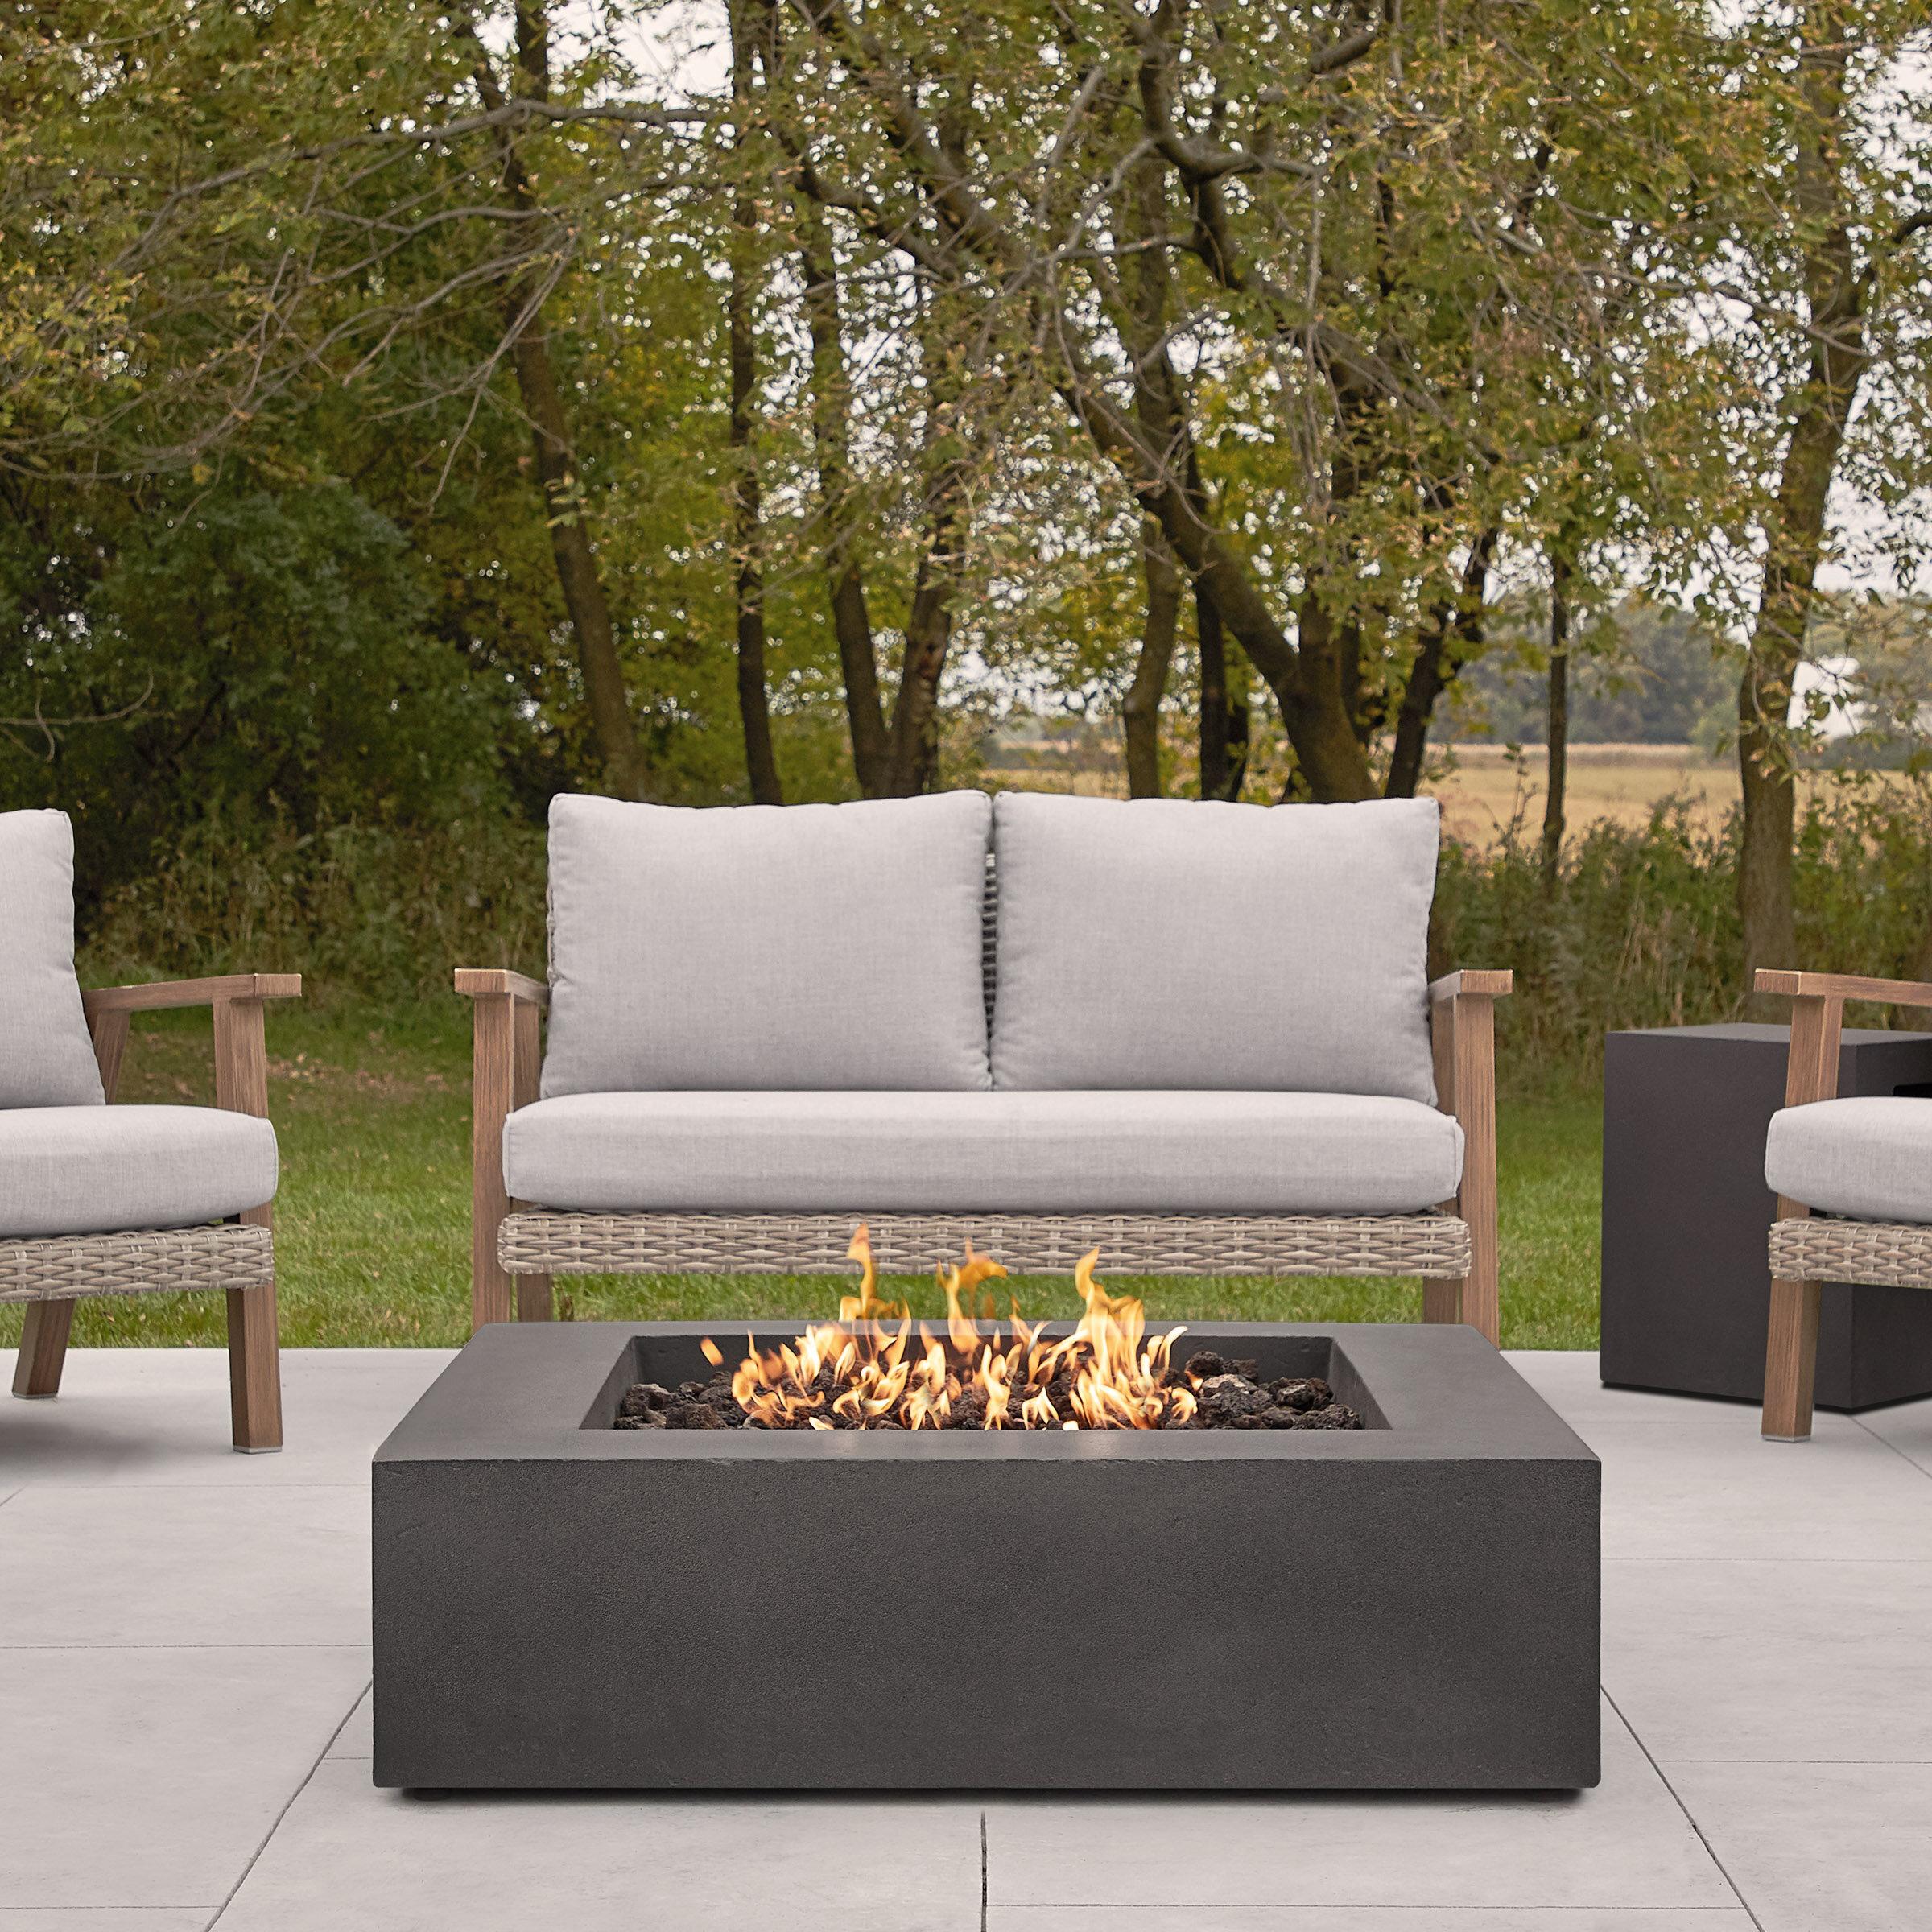 Orren Ellis Daisley Concrete Propane Gas Fire Pit Table Wayfair